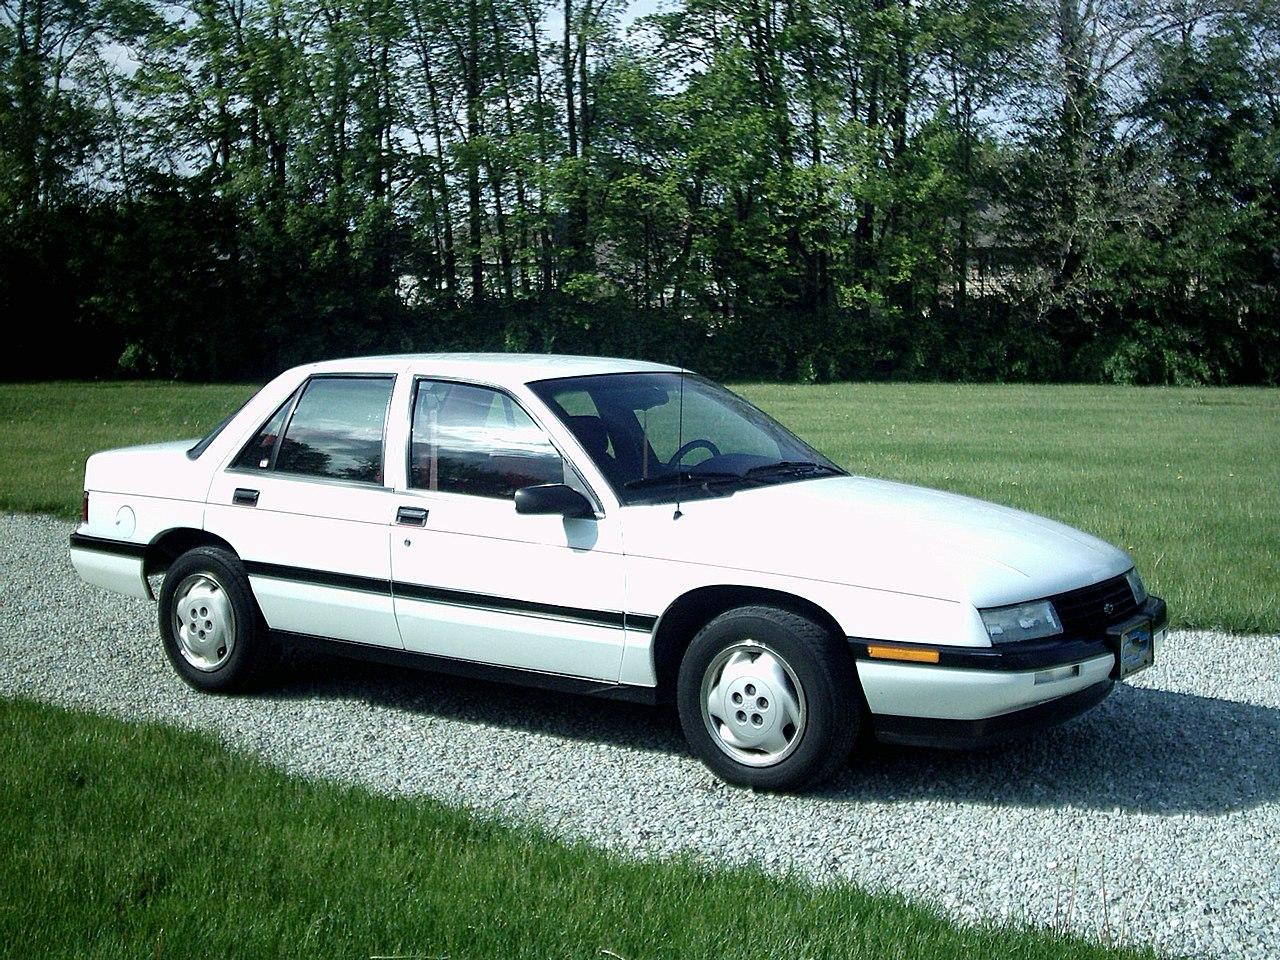 File:Chevrolet Corsica 1994.jpg